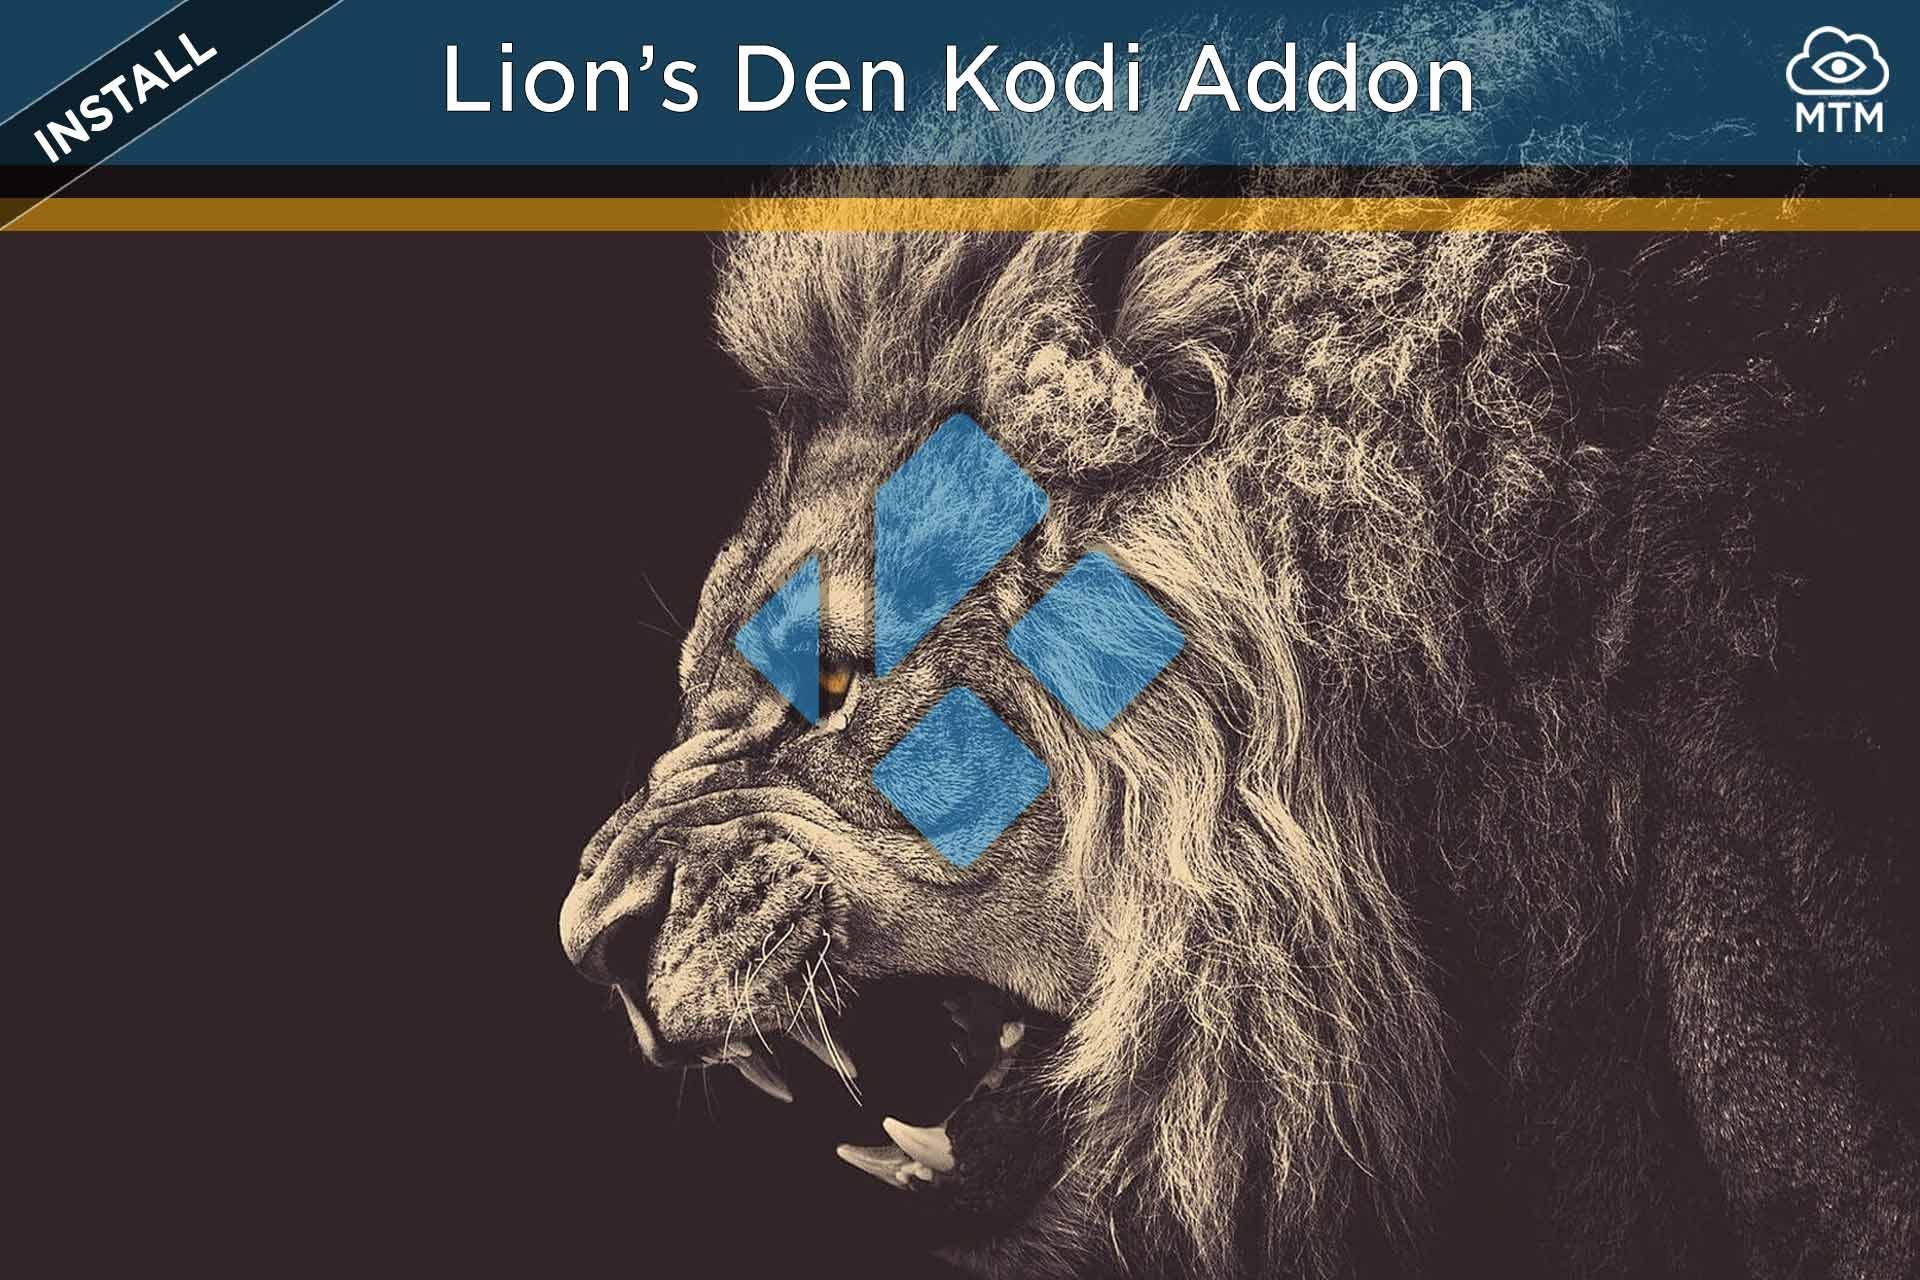 Lions Den Kodi Addon instalatu